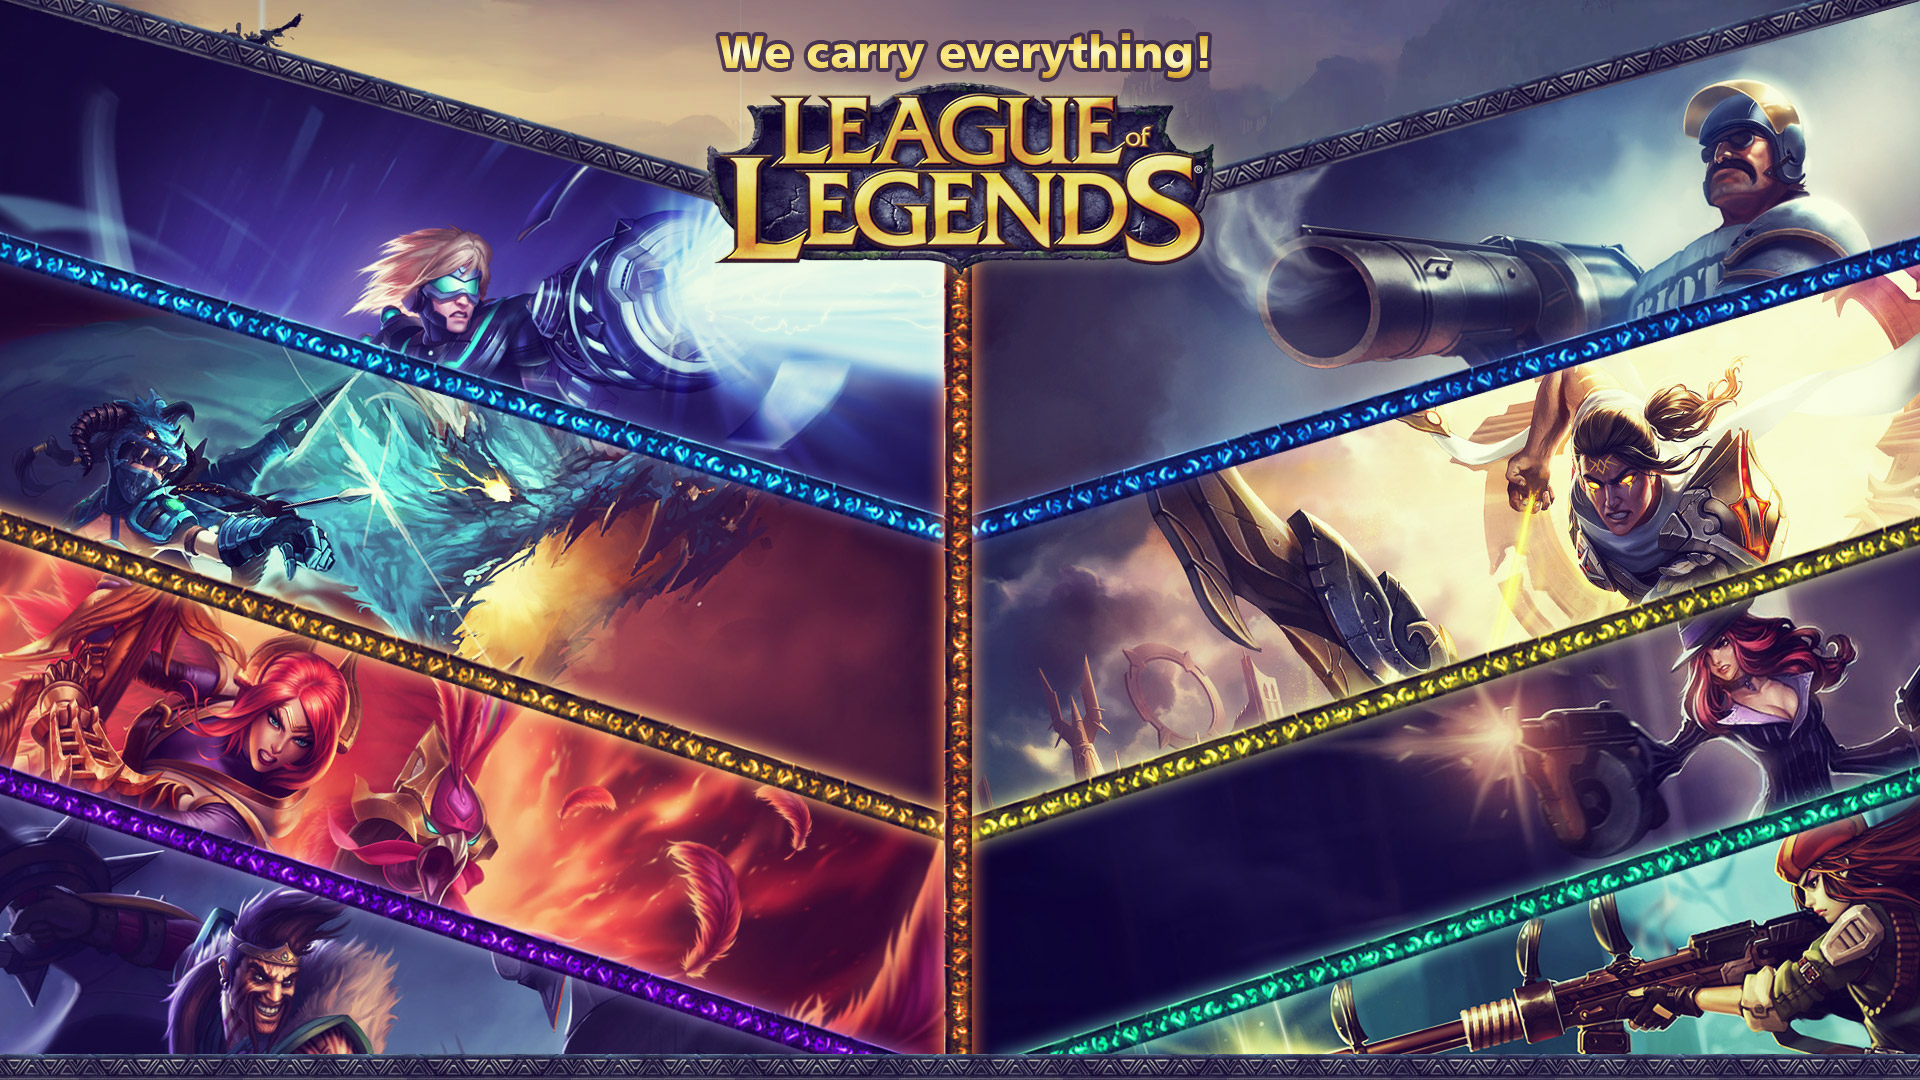 League of Legends wallpaper 129